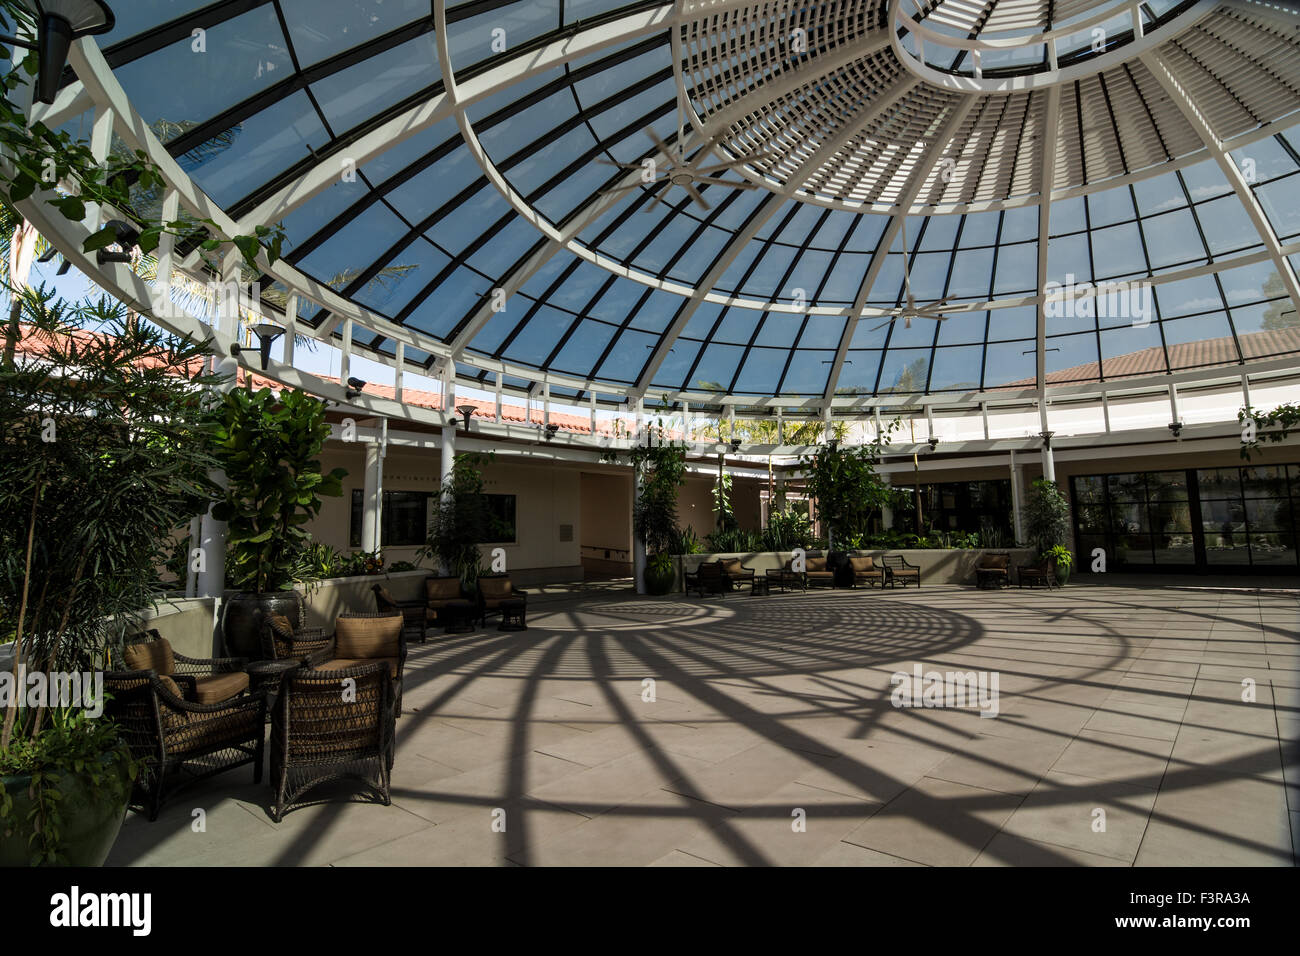 The Garden Dome at the Huntington Library, San Marino, CA, U.S.A. - Stock Image